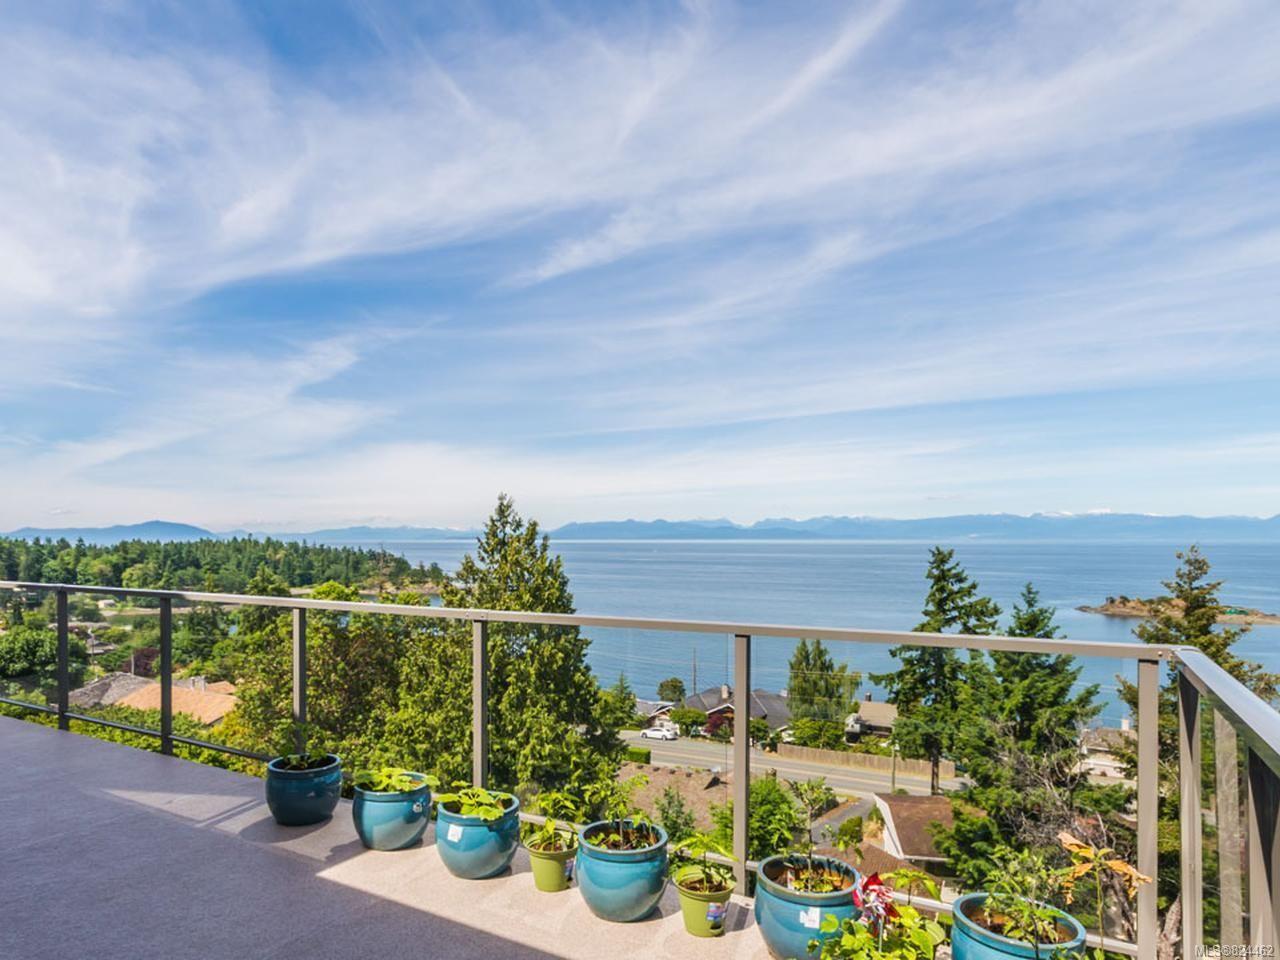 Photo 33: Photos: 3864 Gulfview Dr in NANAIMO: Na North Nanaimo House for sale (Nanaimo)  : MLS®# 824462